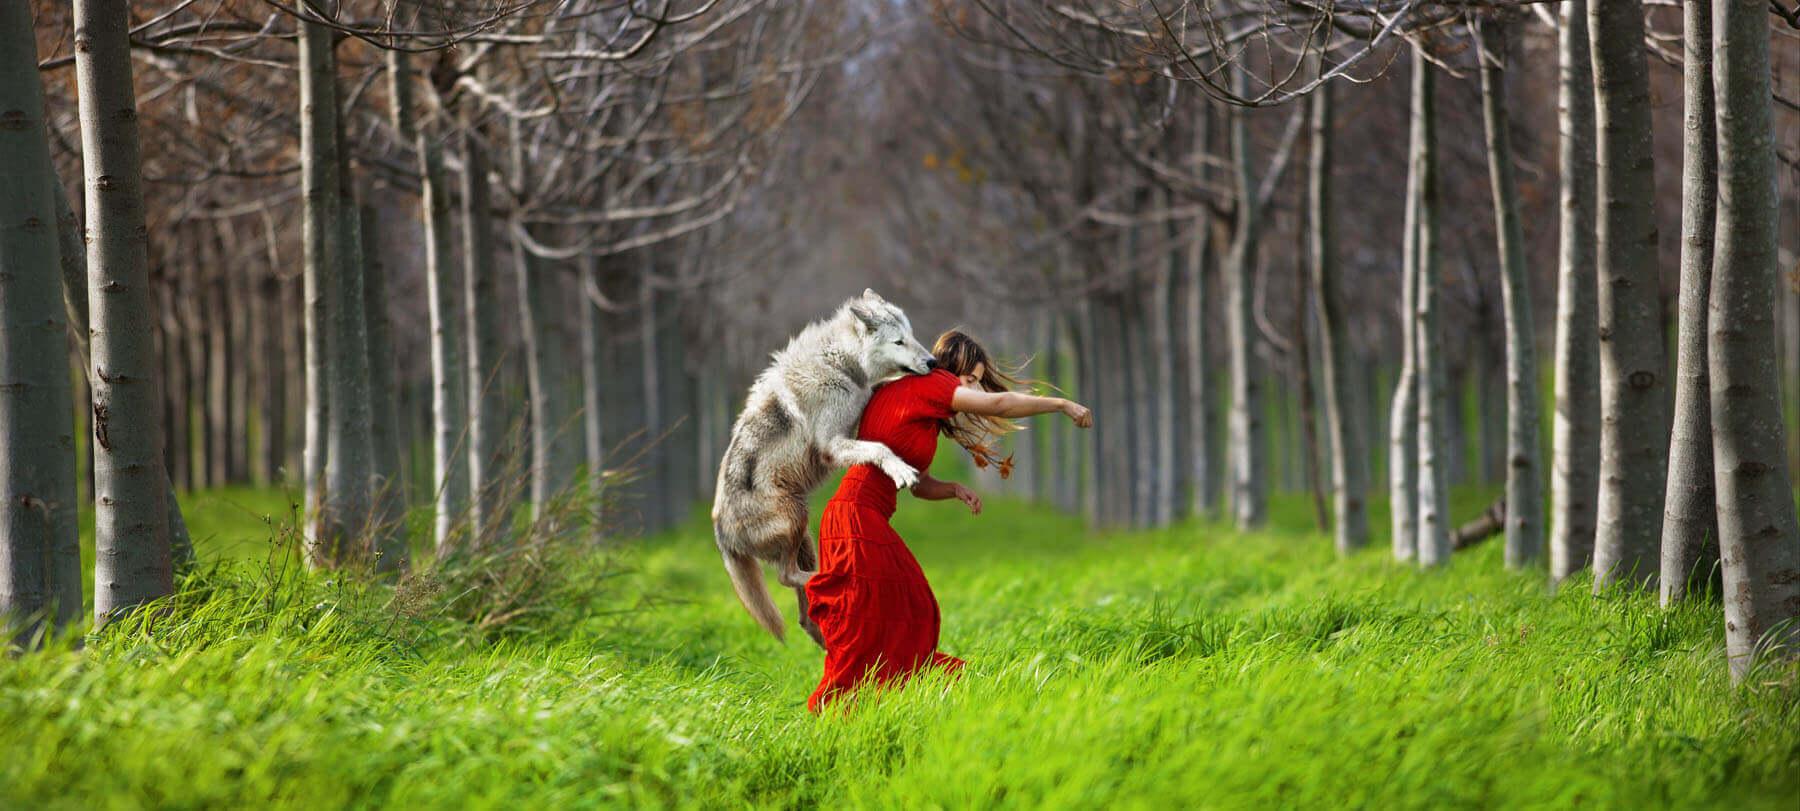 Little Red Riding Hood - SN - Eden Gallery